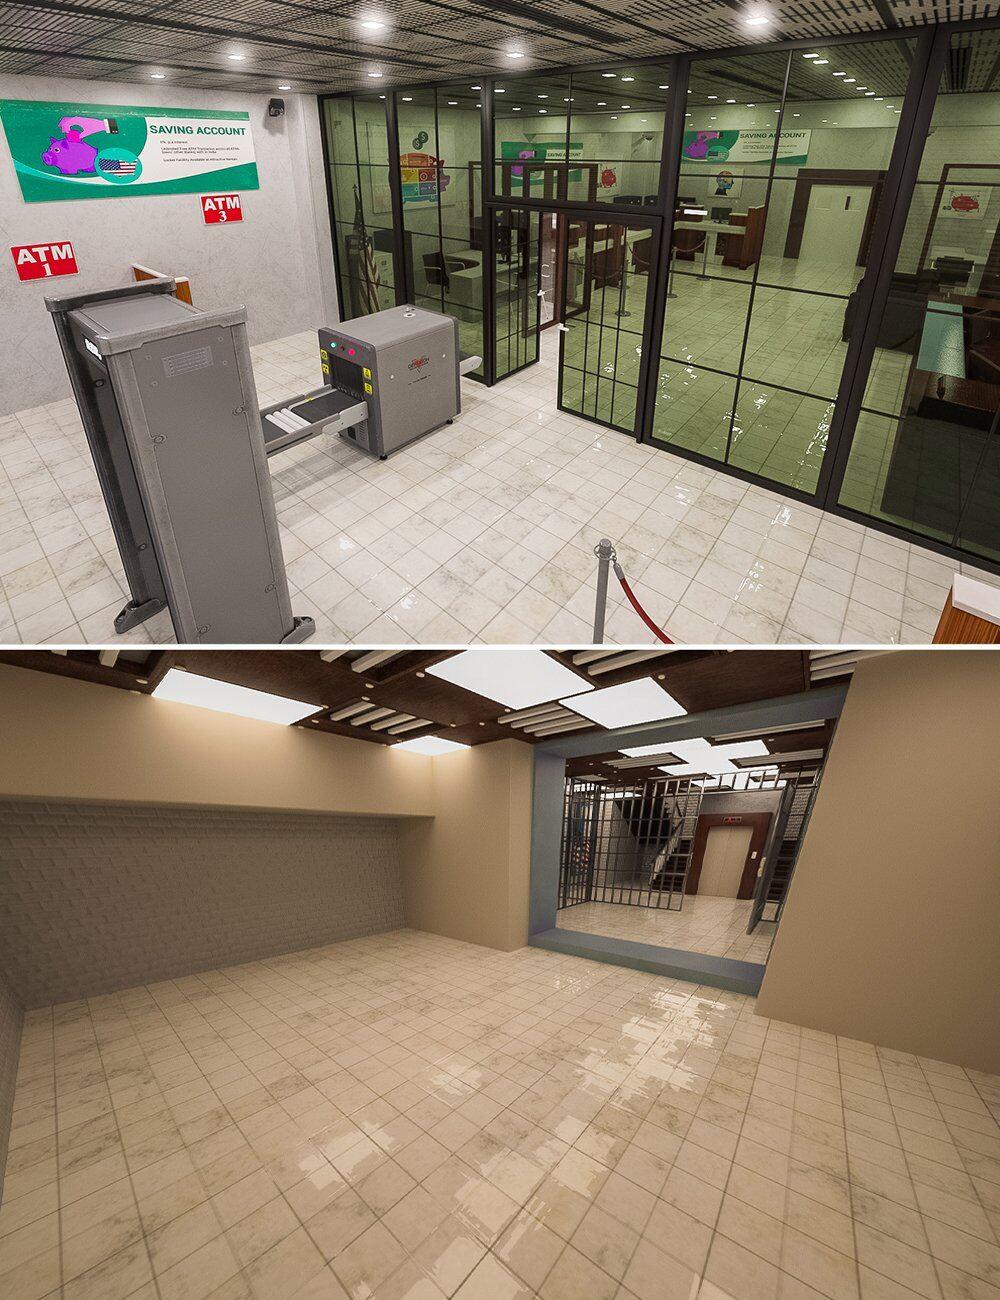 Bank Heist Environment_DAZ3D下载站